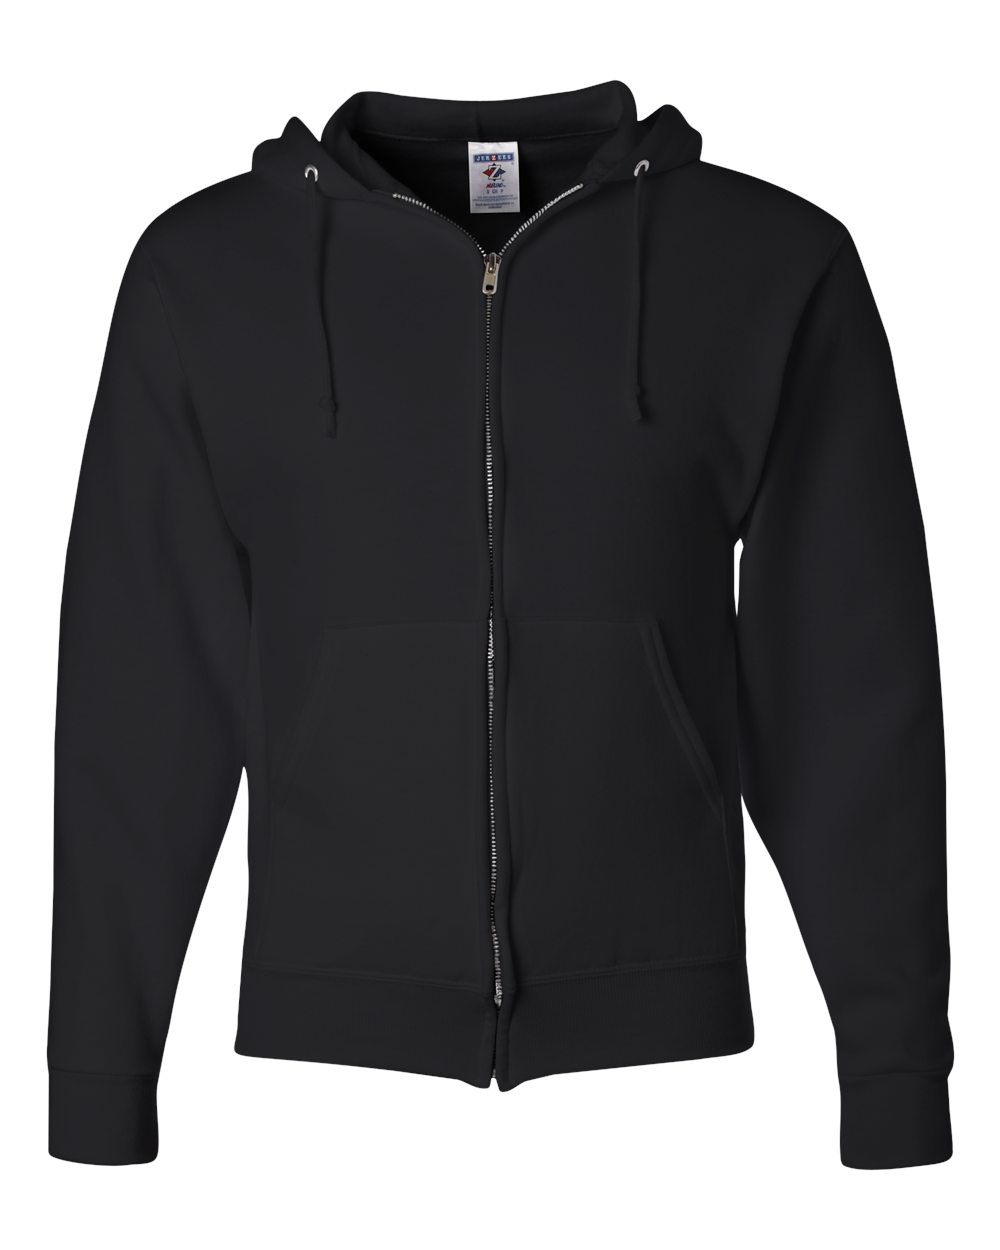 Picture of Jerzees Nublend Full-Zip Hooded Sweatshirt